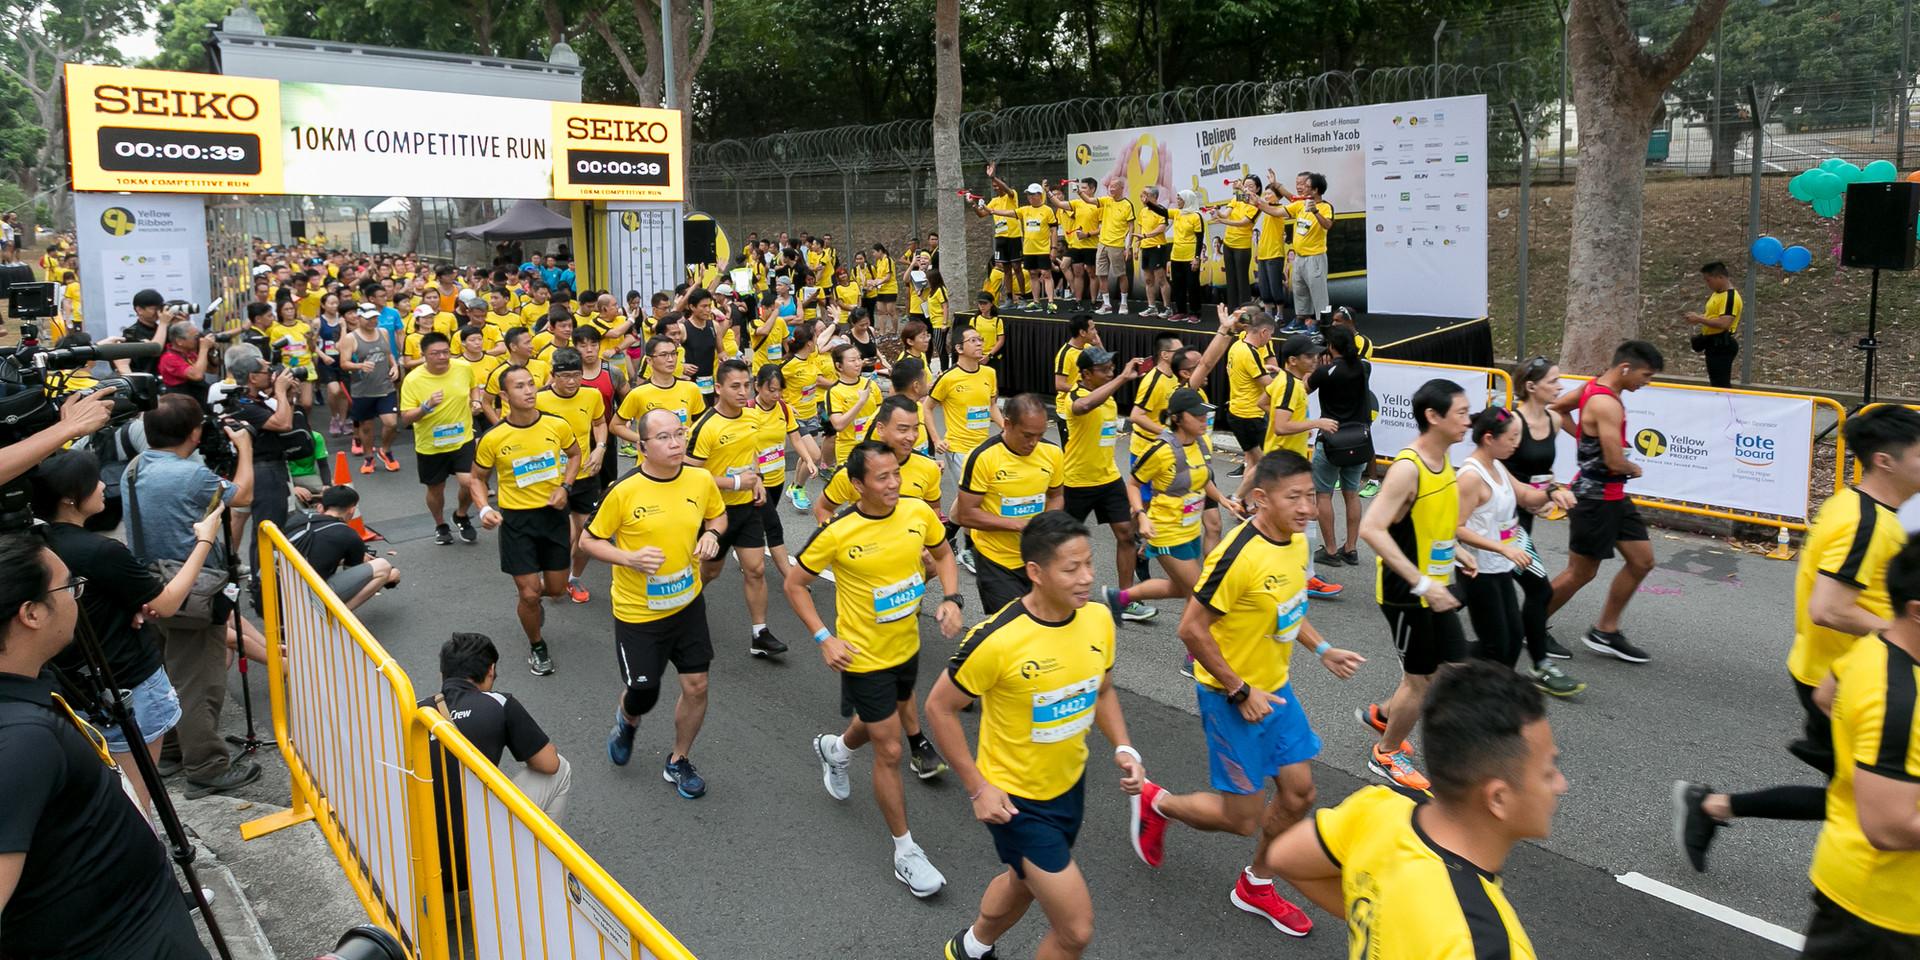 YellowRibbonRun 2019 15thSept 2019 -IS-4